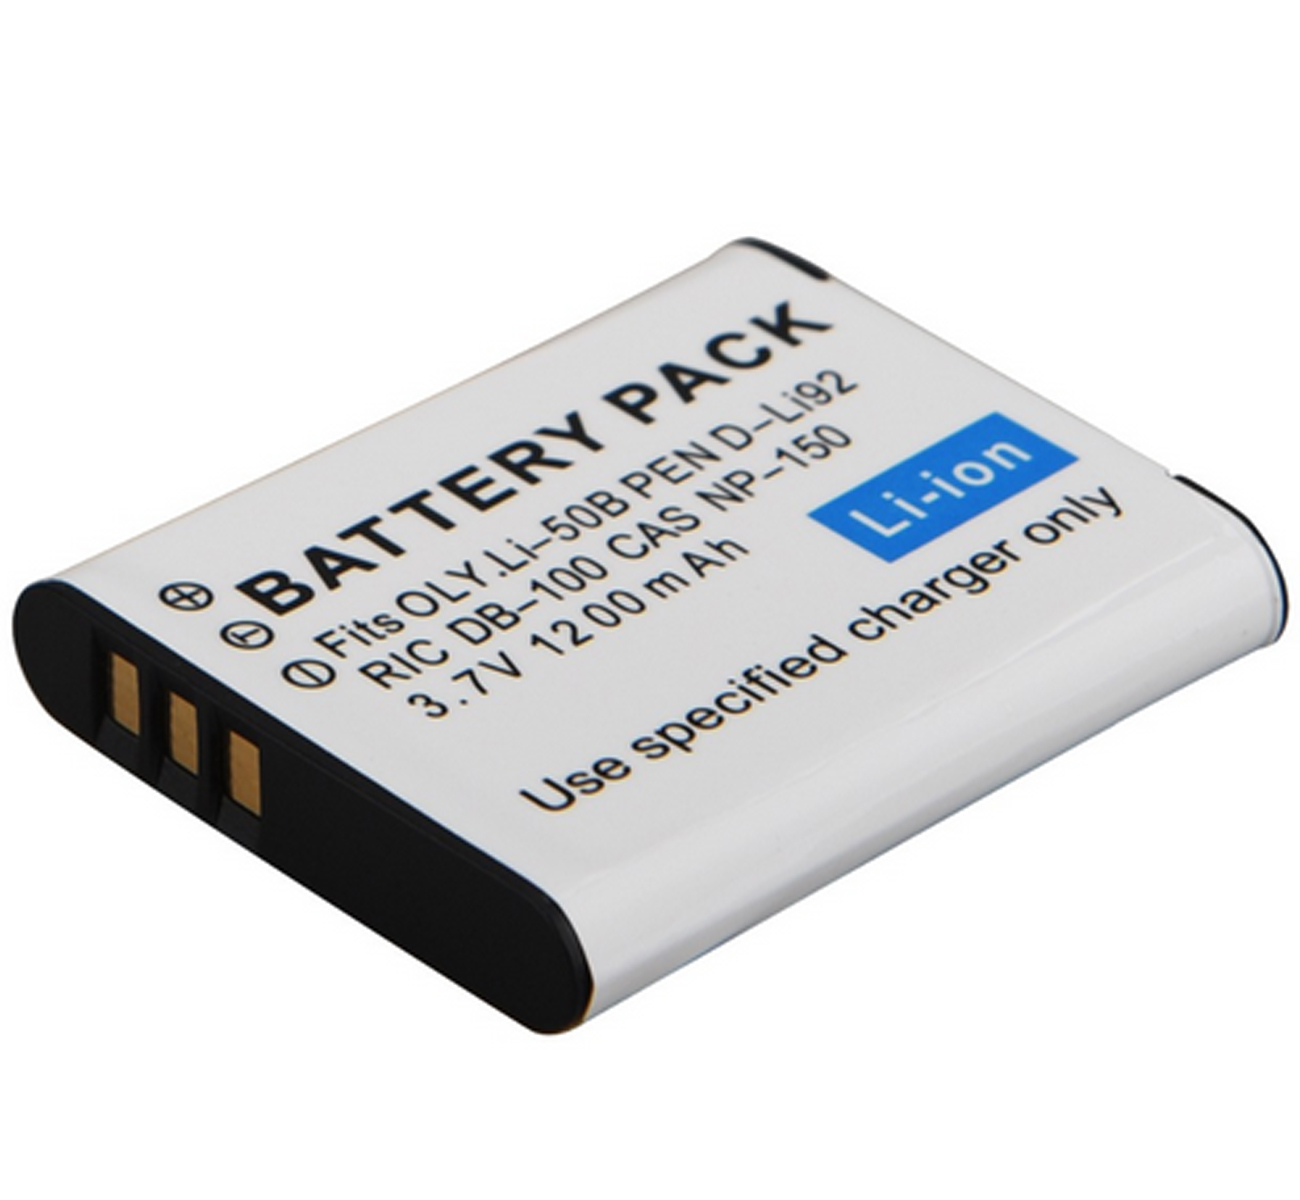 Перезаряжаемый литий-ионный аккумулятор для аккумулятора для Pentax D-LI92 и Ricoh D-LI92, DLI92, D-L192